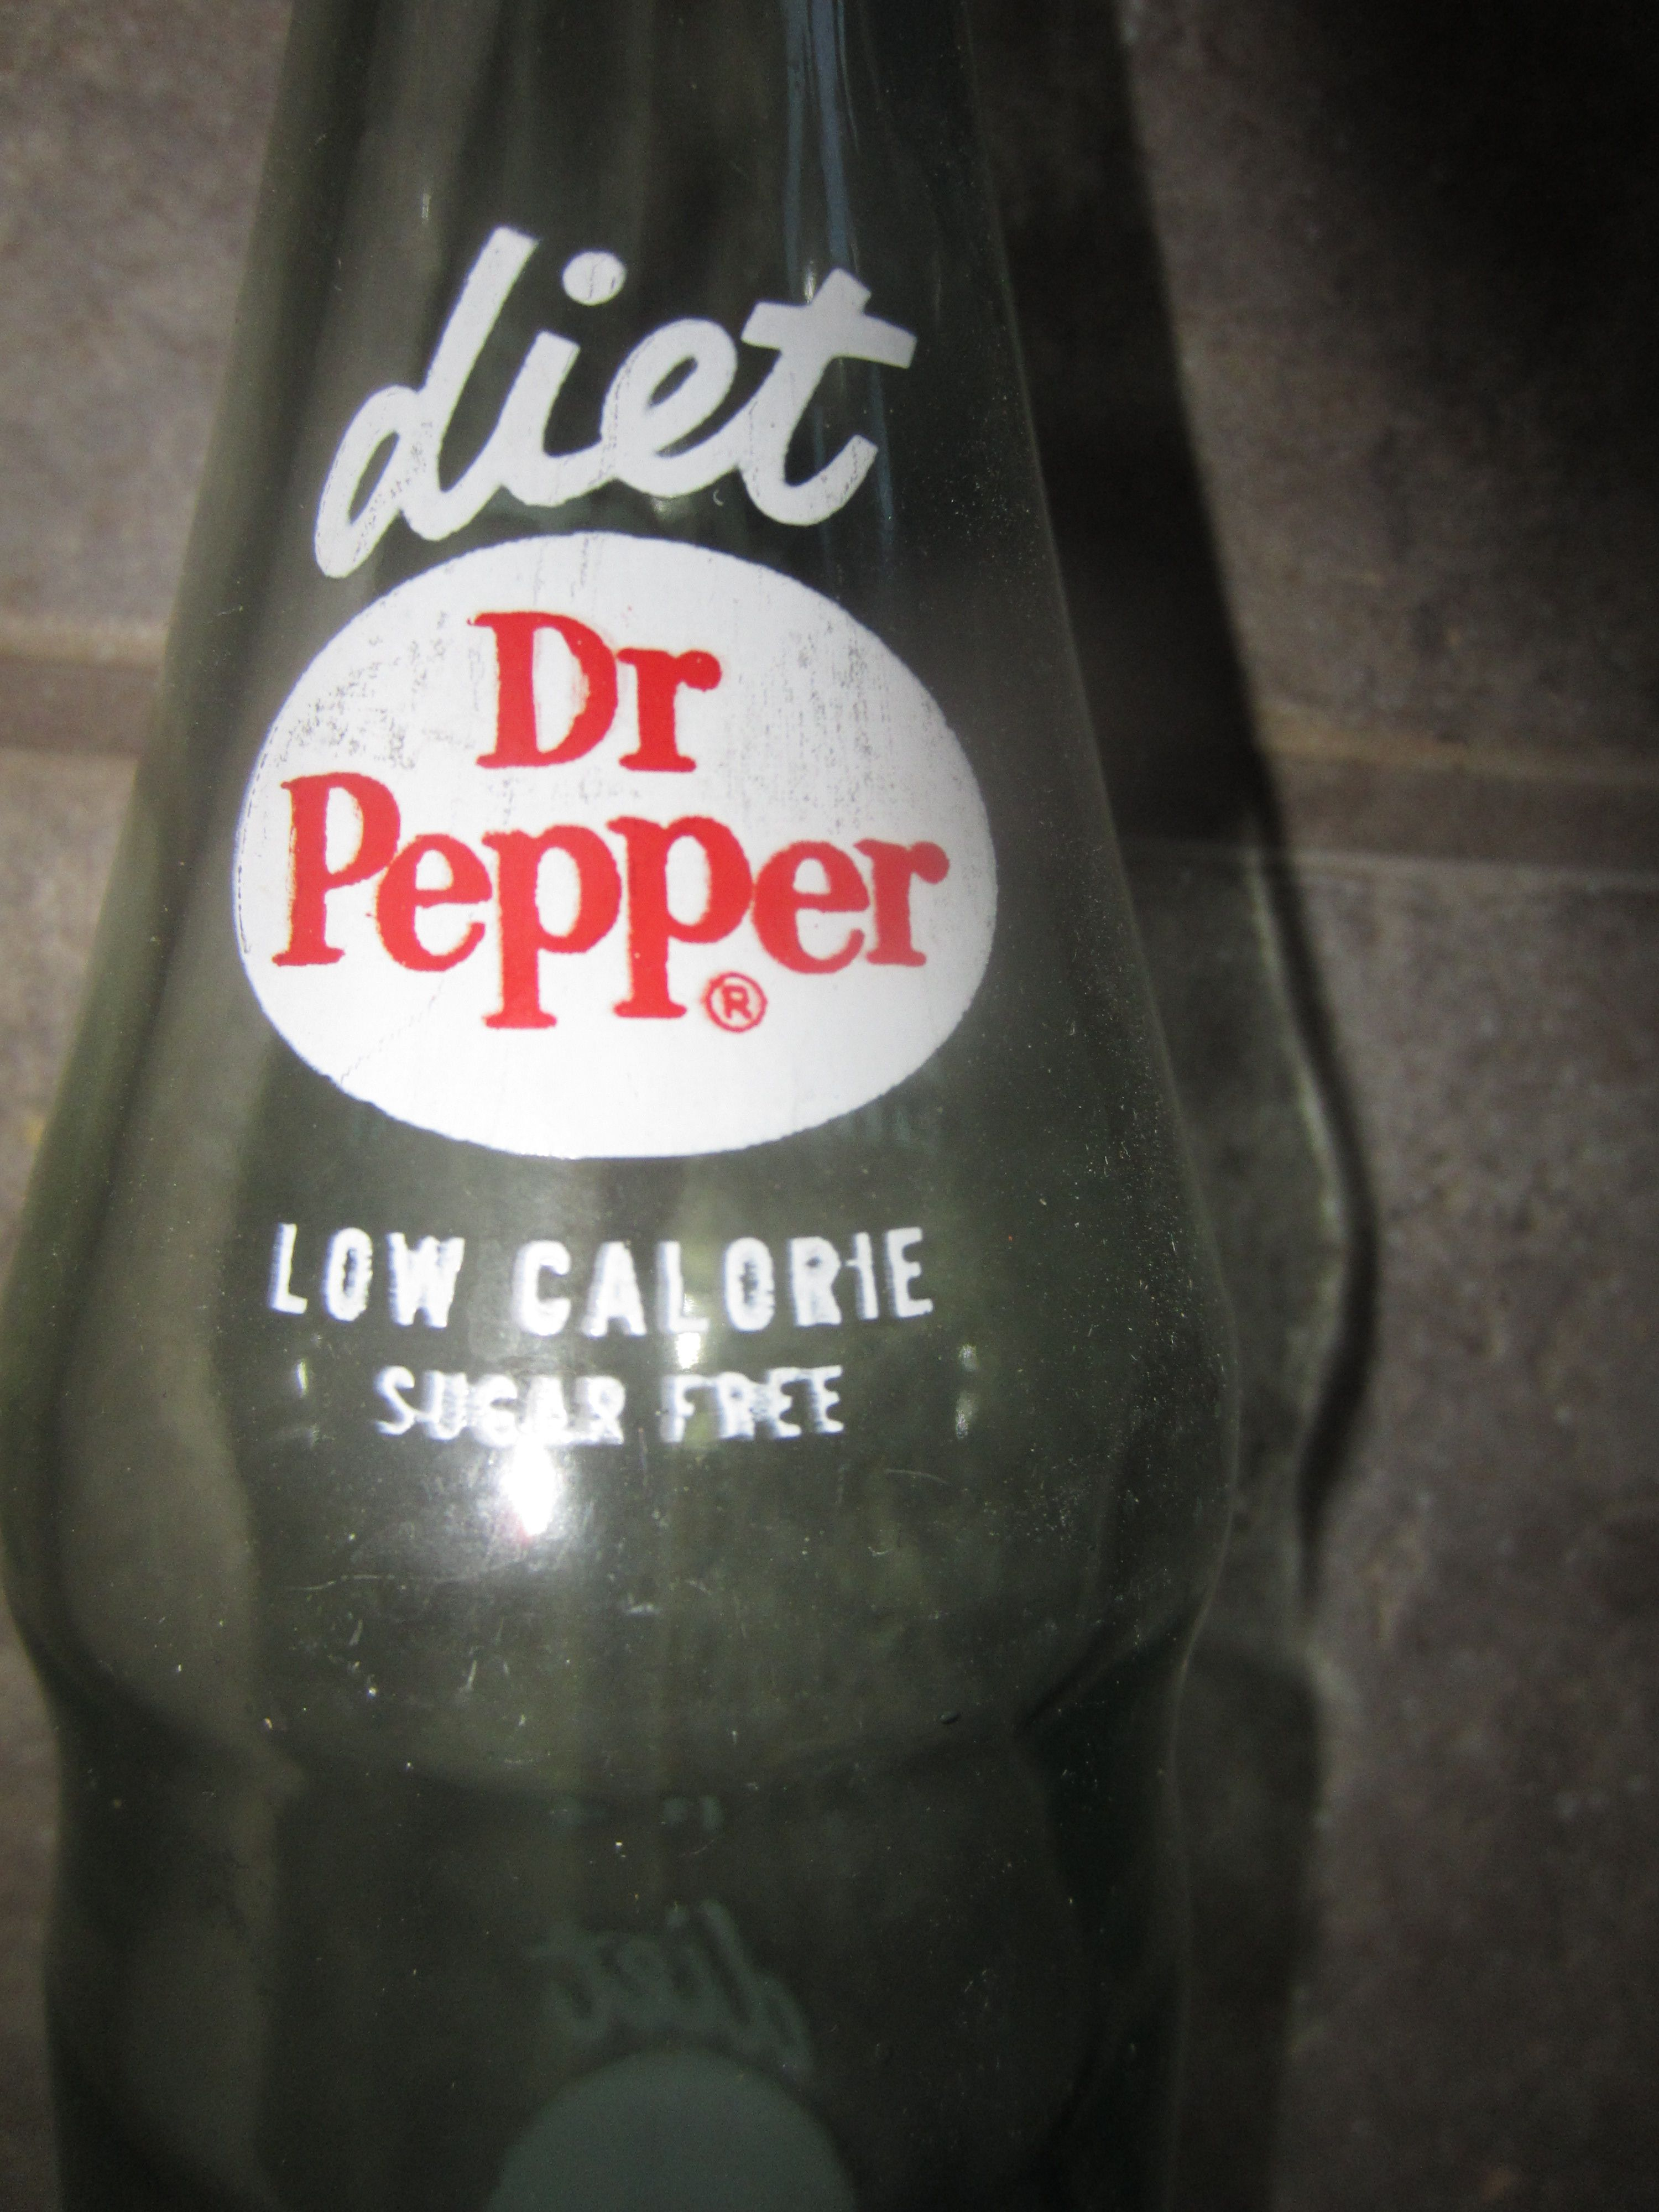 Vintage 1960 S Diet Dr Pepper Glass Bottle Atomic 1 Pint Size Kookykitsch Com Dr Pepper Diet Dr Pepper Stuffed Peppers